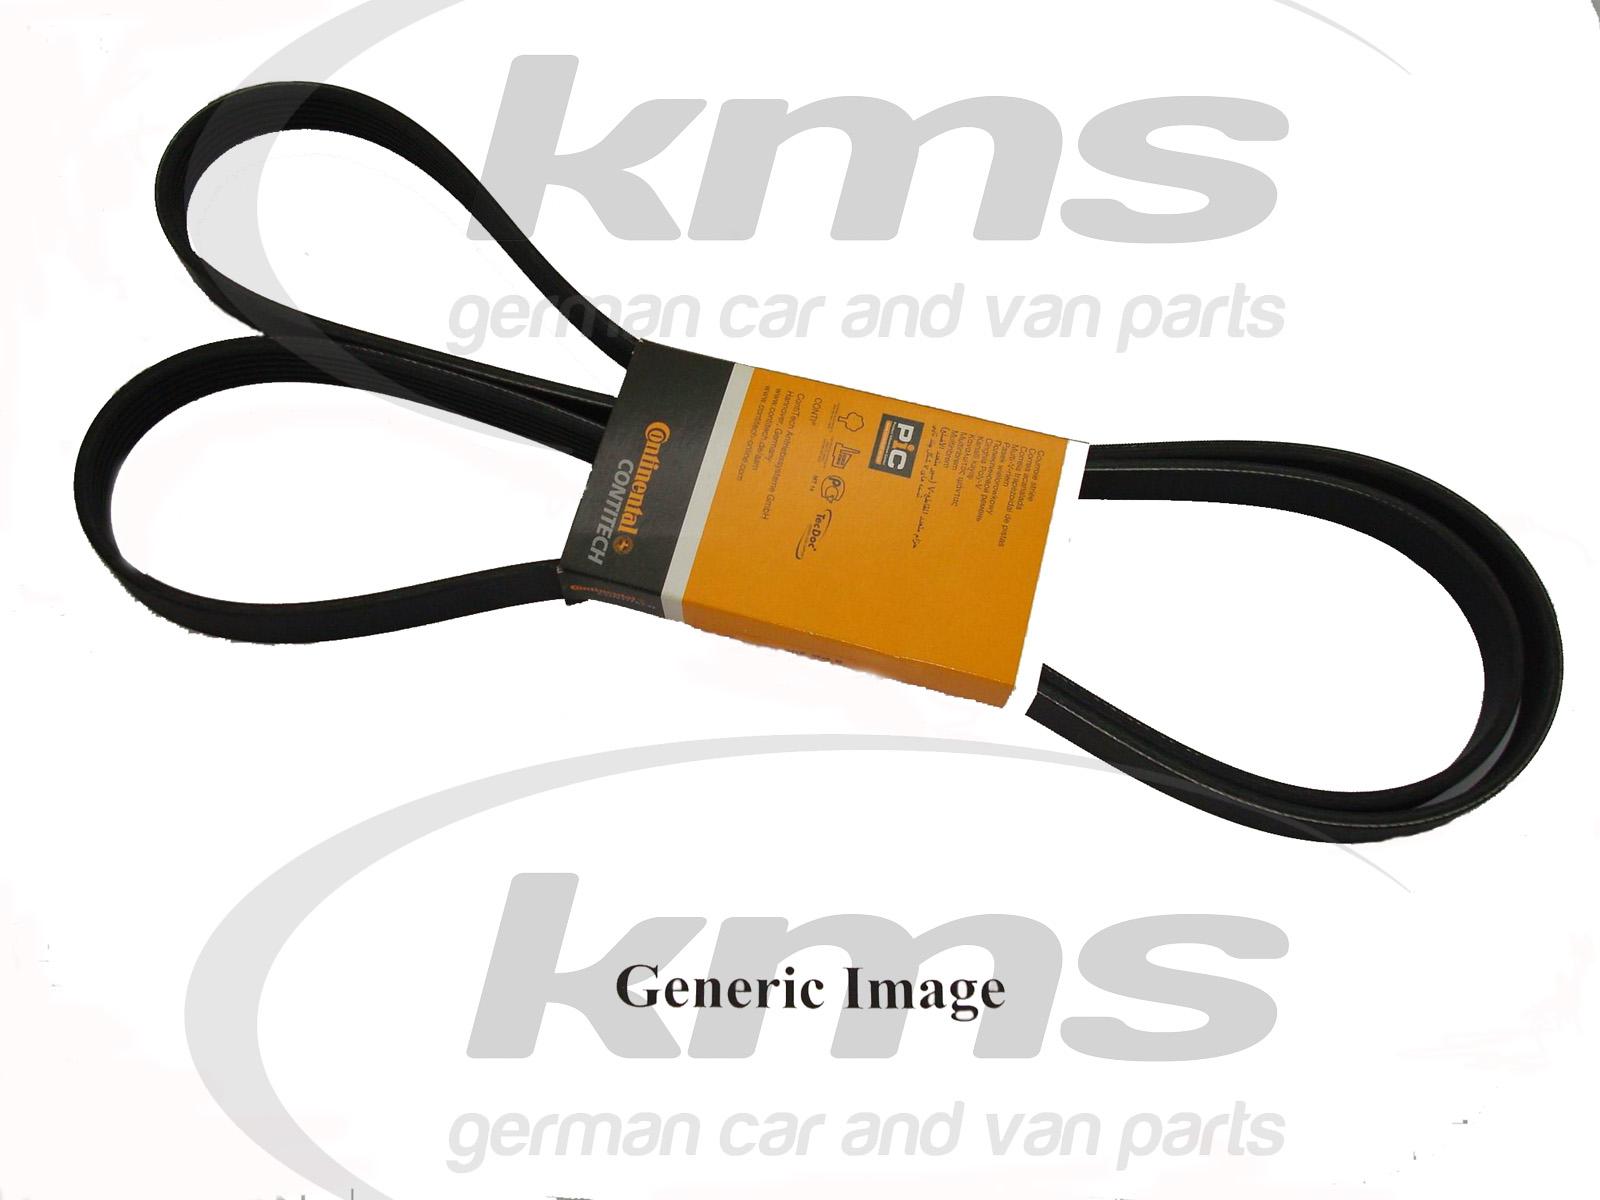 Poly v belt w203 c240 c320i 00 mercedes clk w209 coupe for Poly v belt for mercedes benz